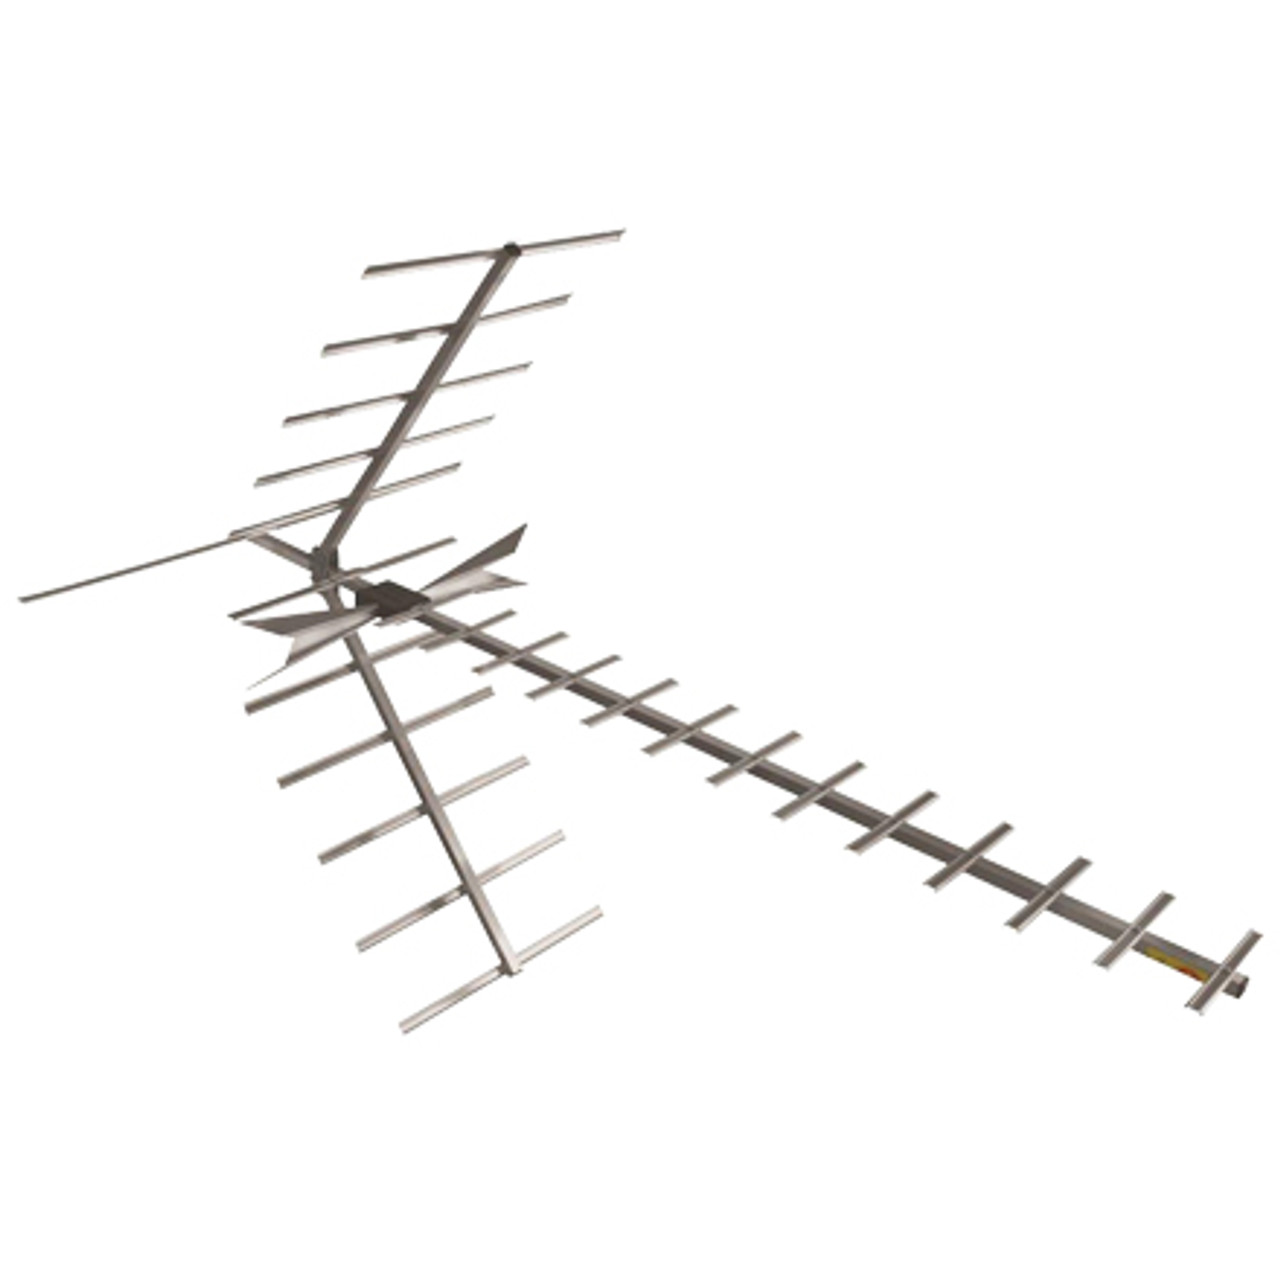 DigiTenna® DT-XFAMP20-2 Extreme Fringe Antenna w/ Embedded Amplifier & Extra Input VHF Hi-Band/UHF, 0-80+ Miles